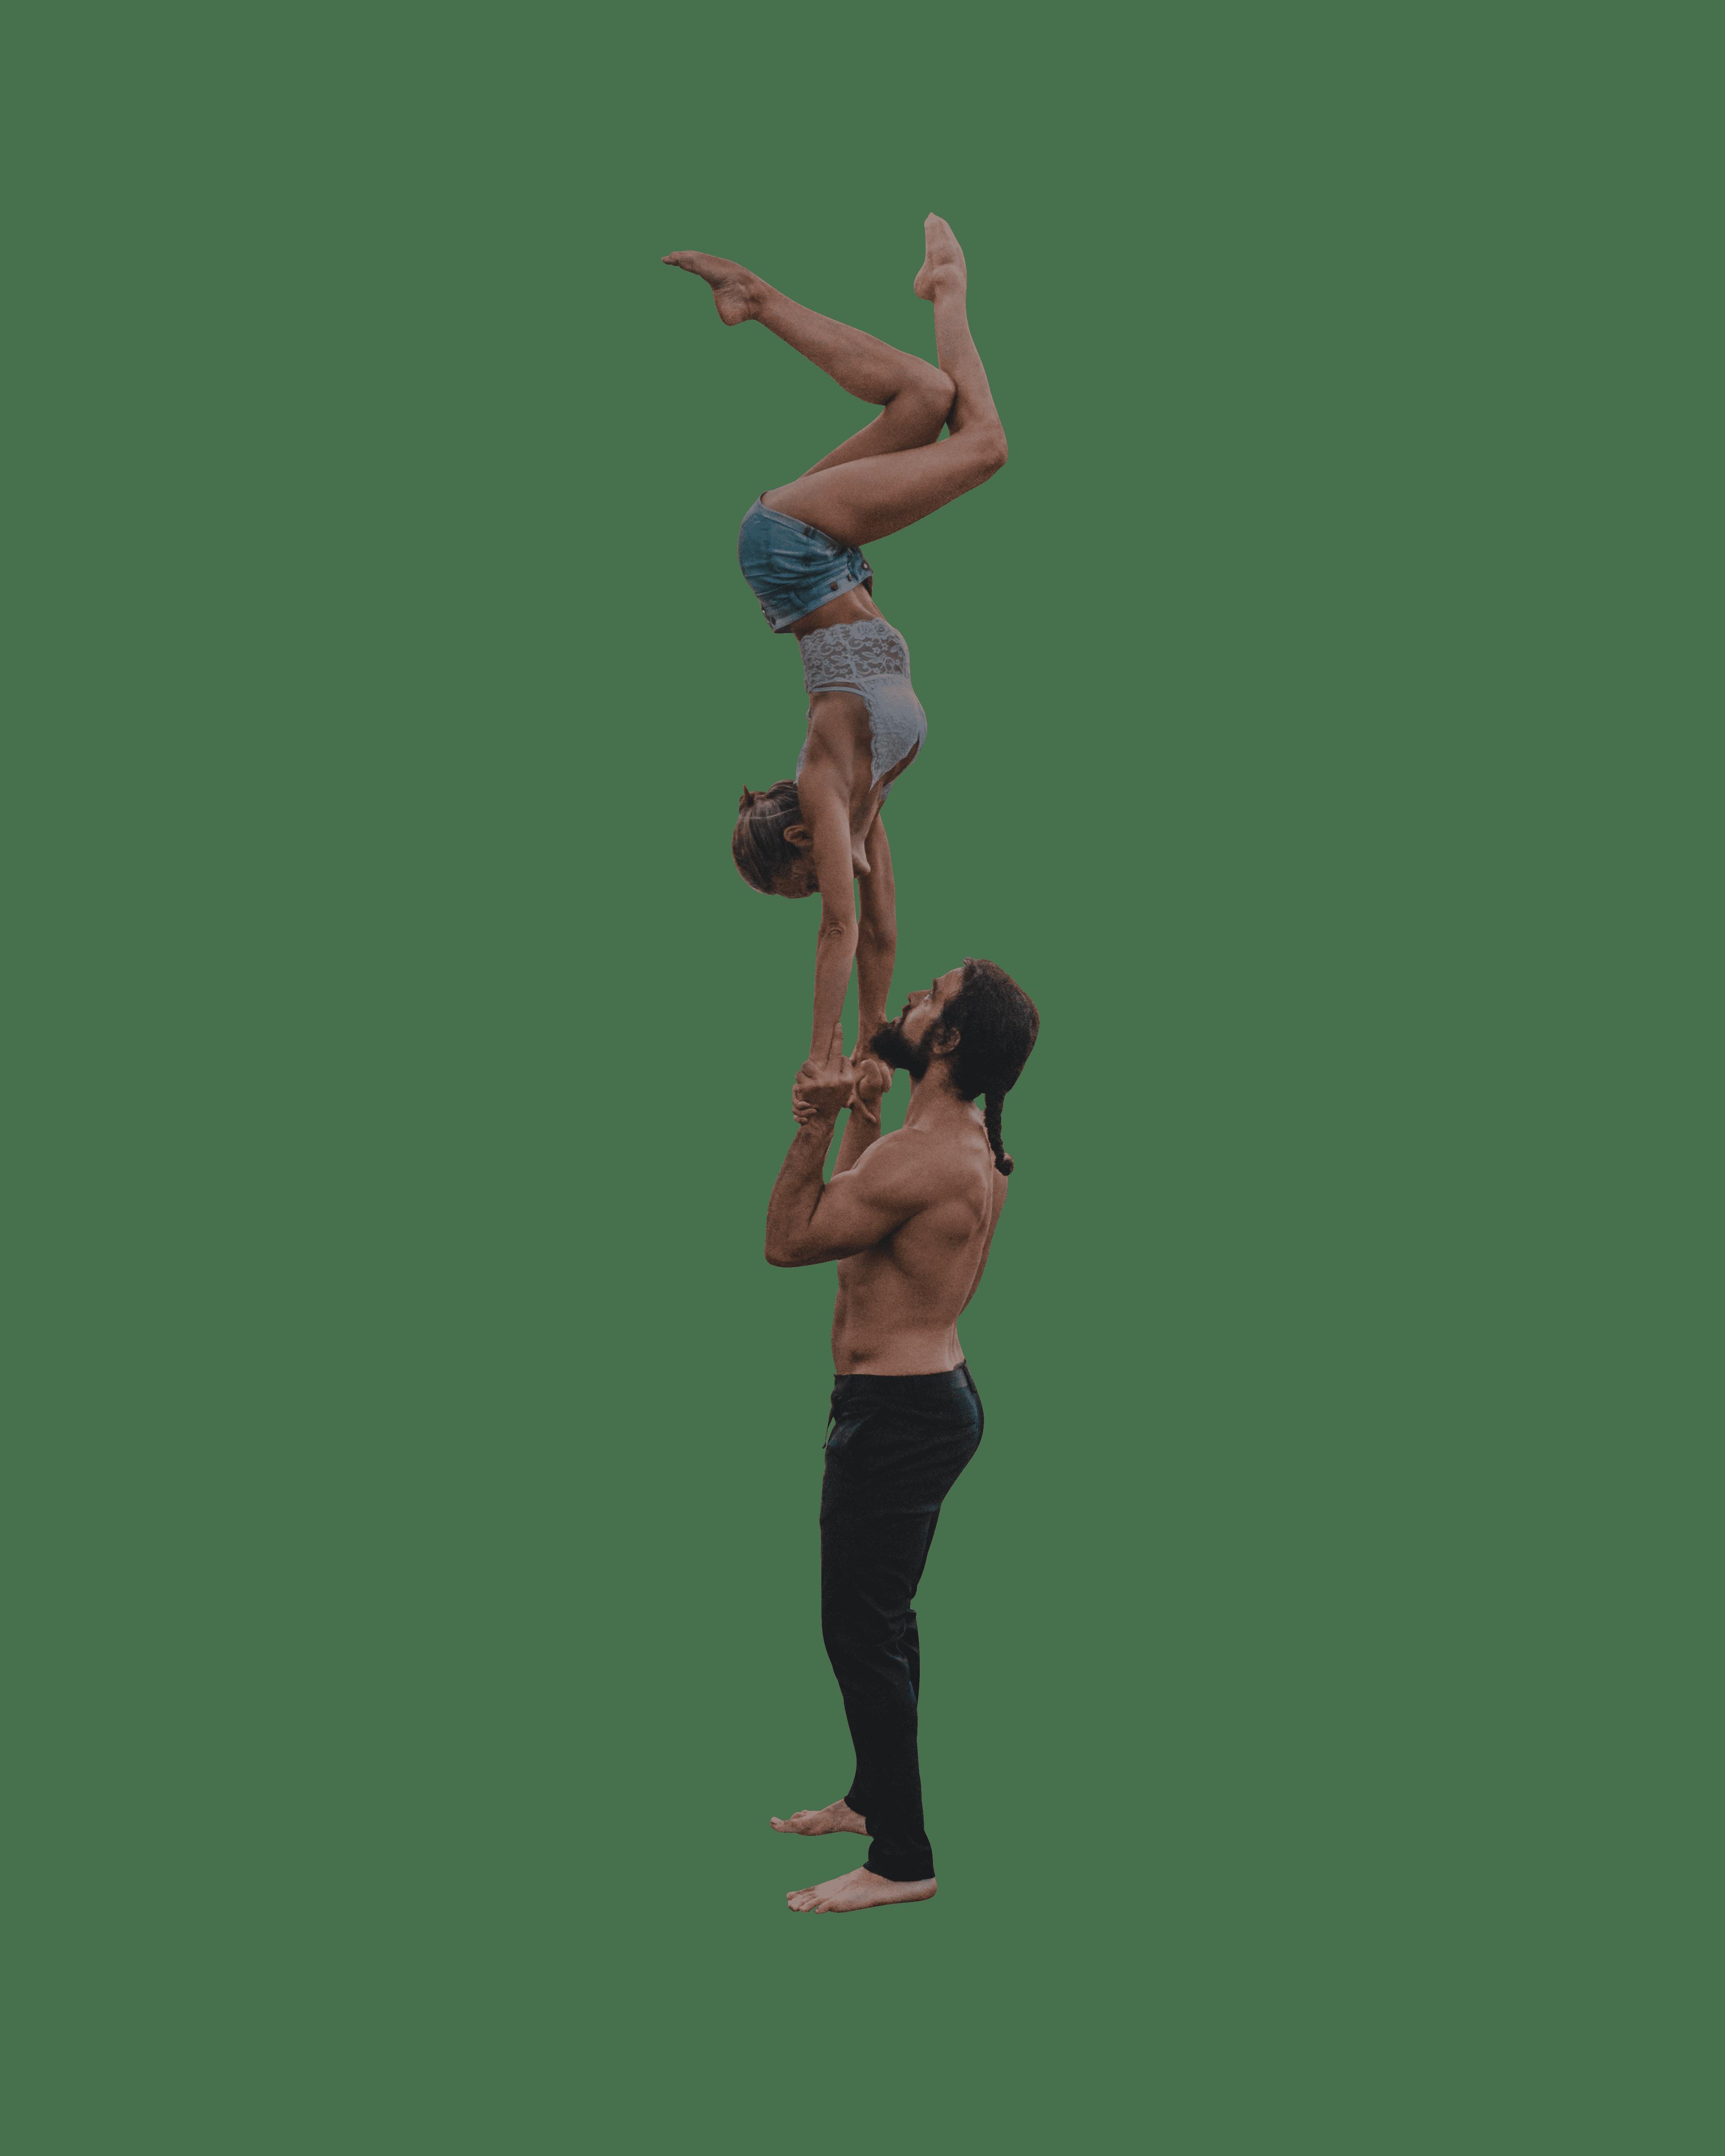 Acrobatic gymnastics transparent background.png